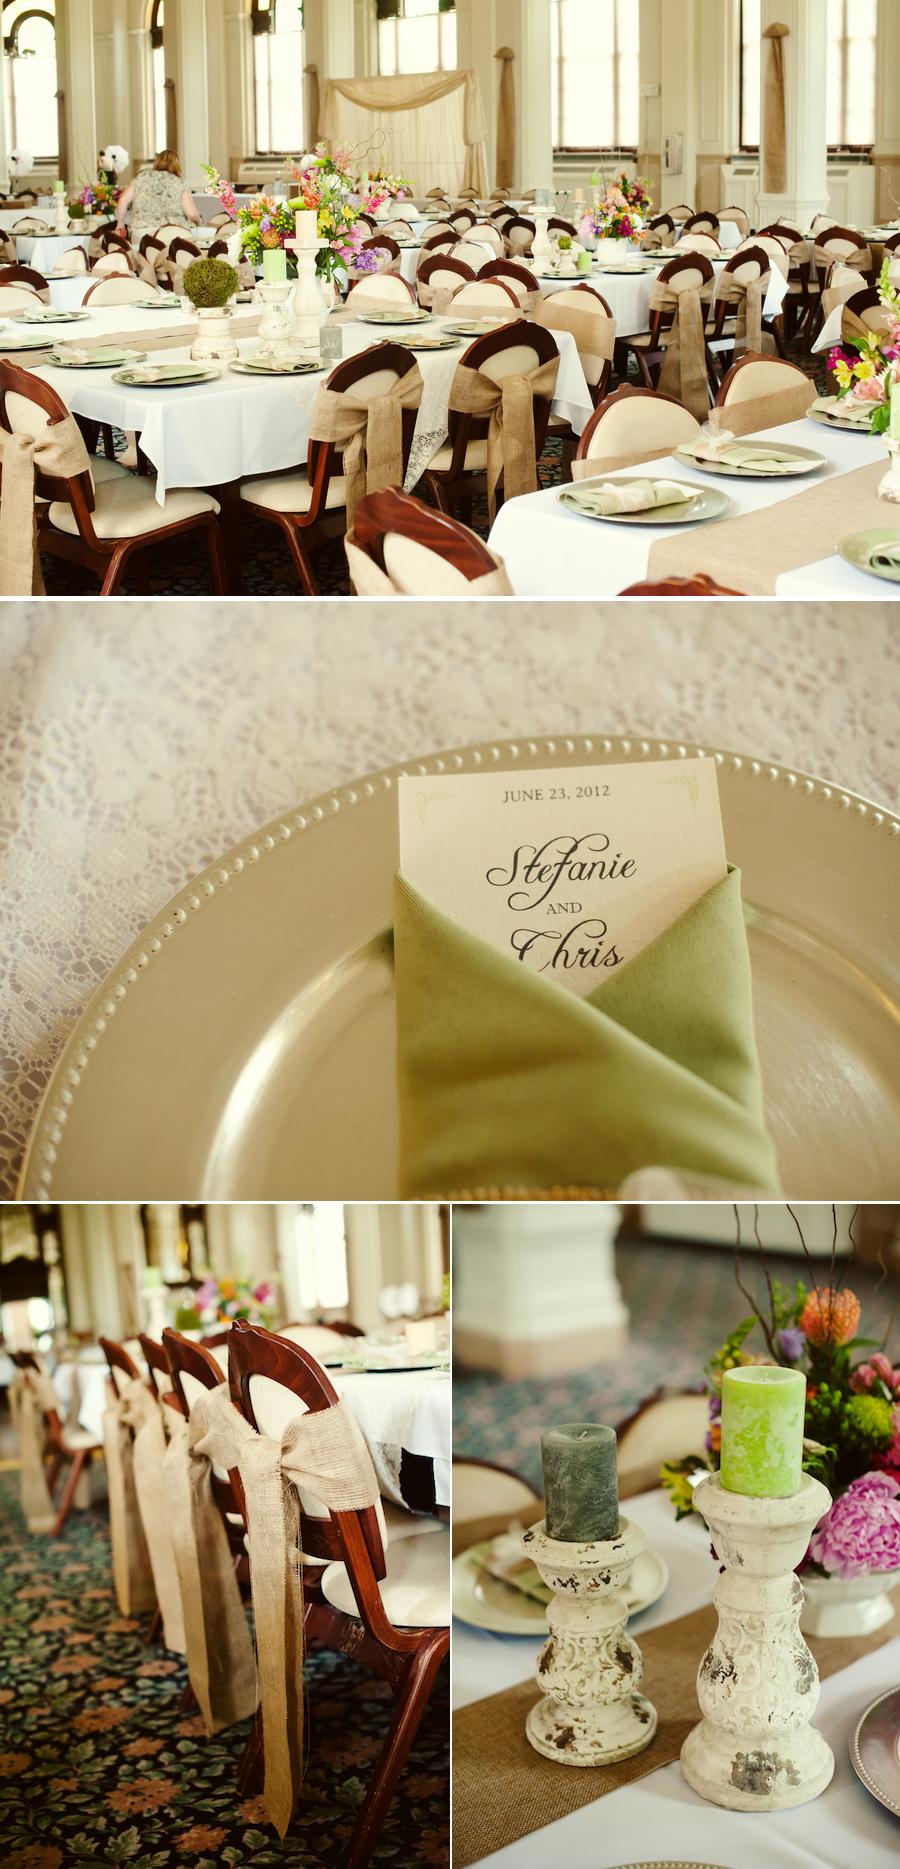 Rustic elegant summer wedding decor details onewed